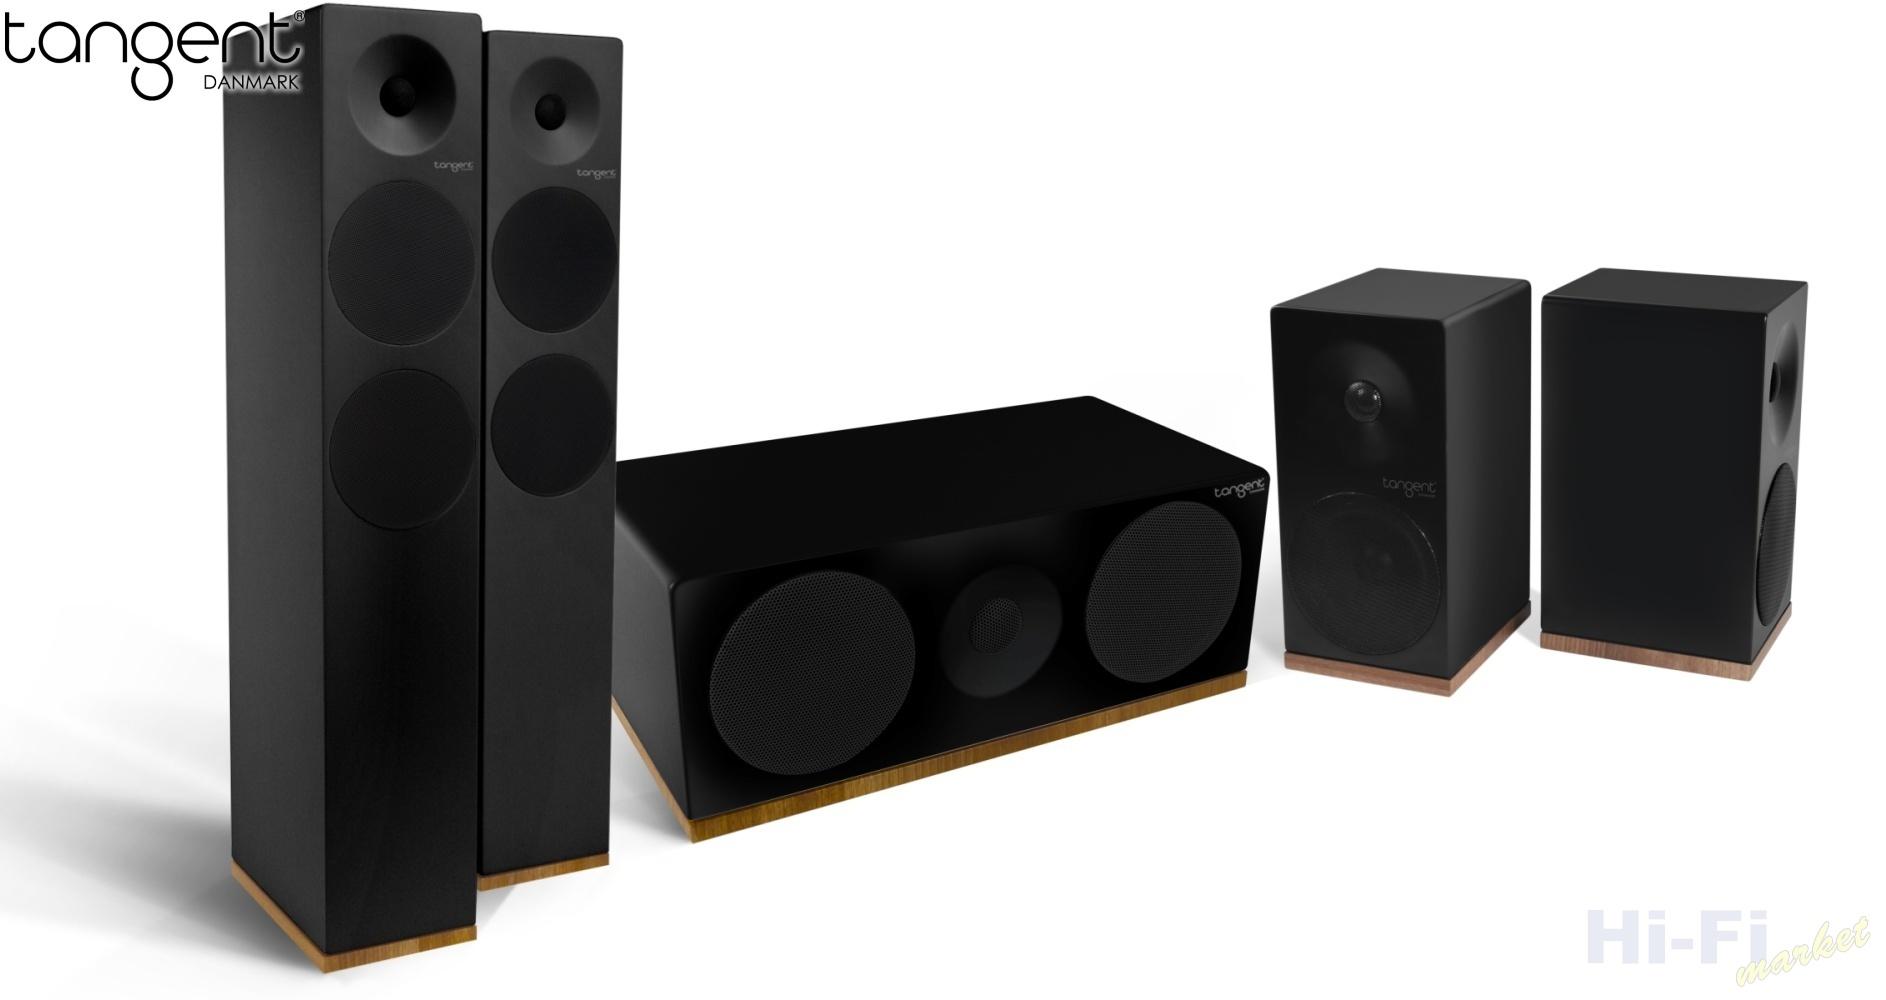 TANGENT Spectrum X6 set 5.0